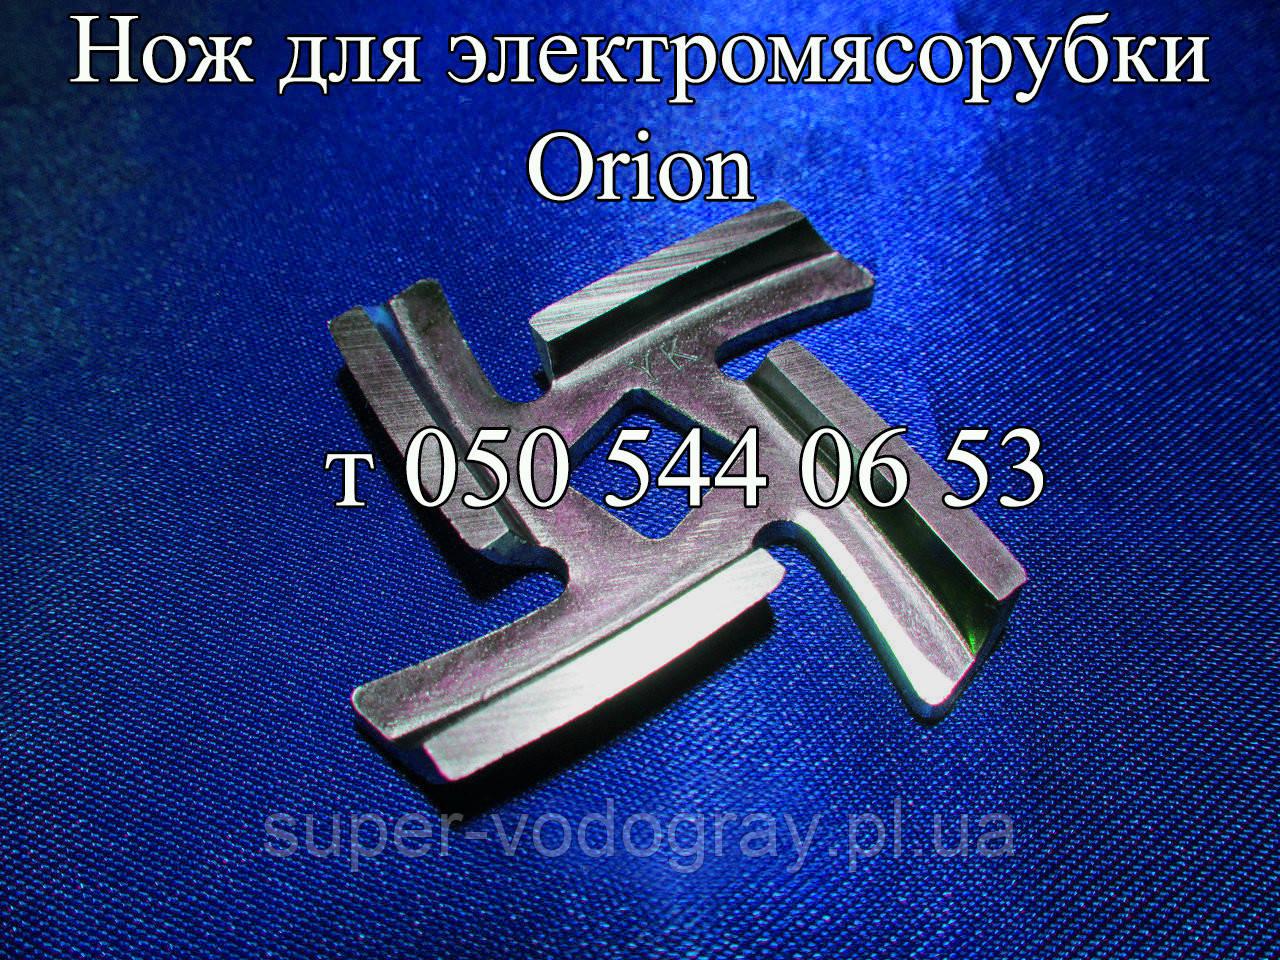 Нож для электромясорубки Orion